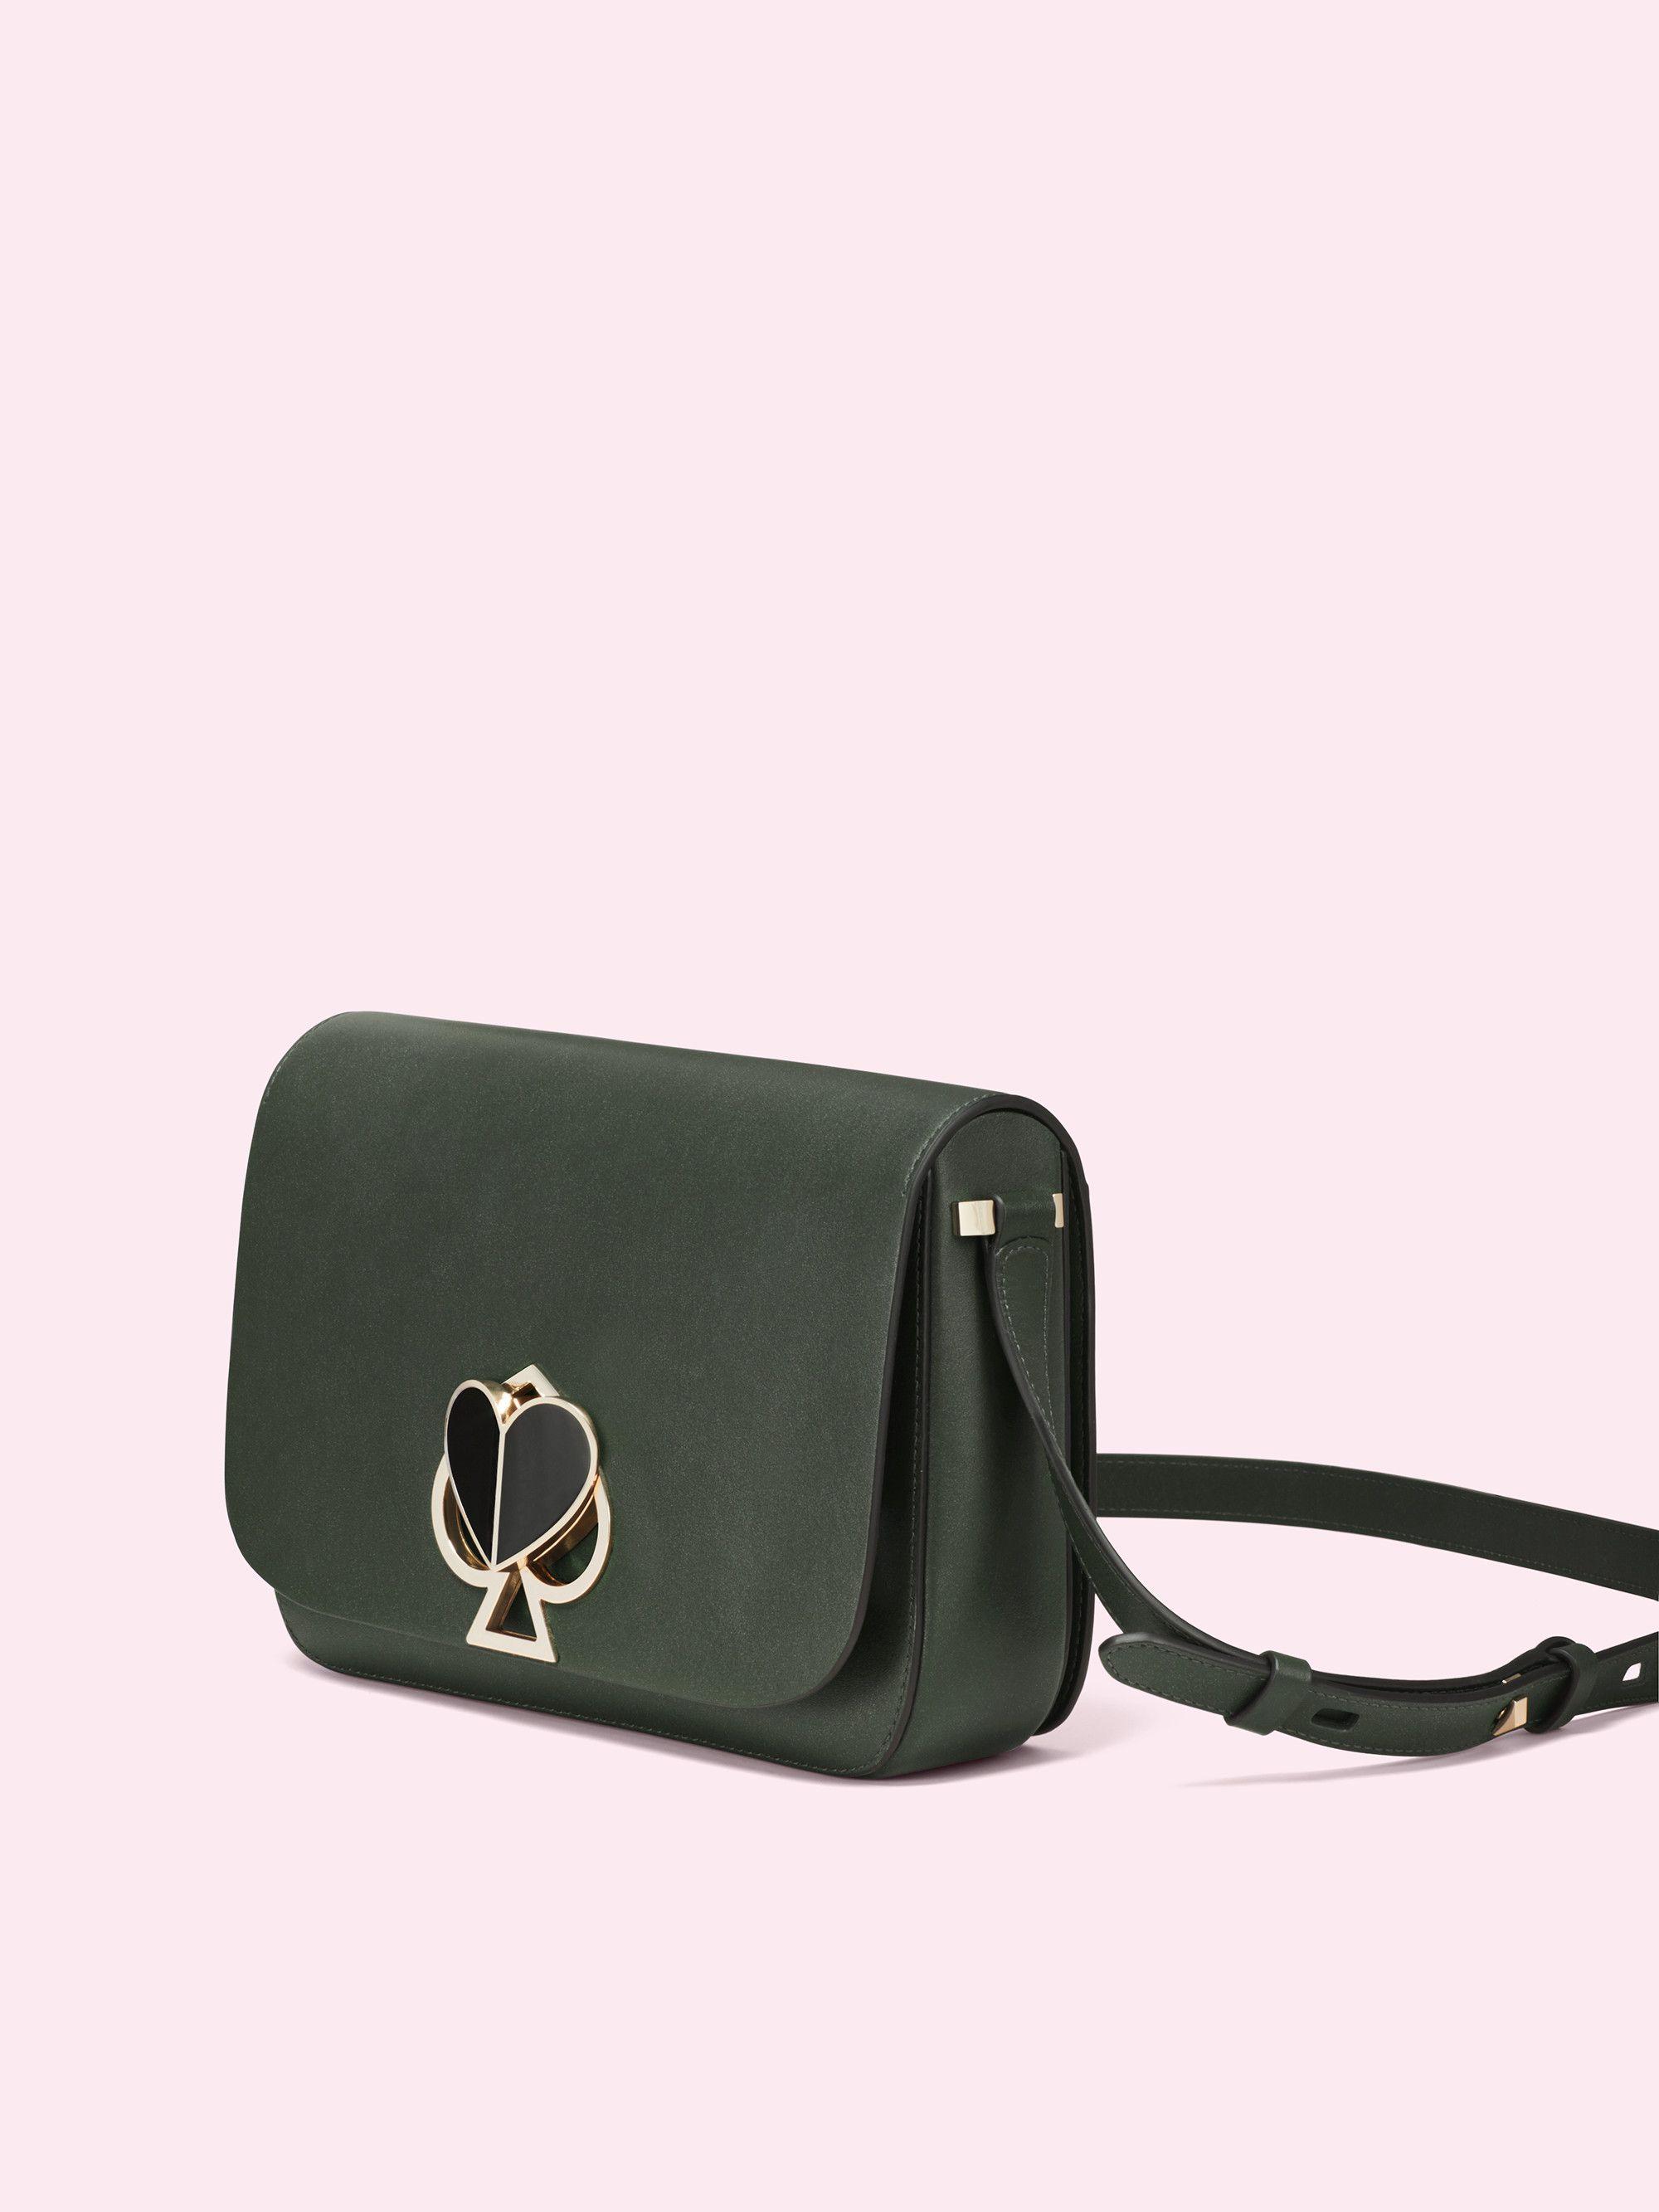 668fc1a054ed0e nicola twistlock medium shoulder bag, kate spade new york   Handbags ...